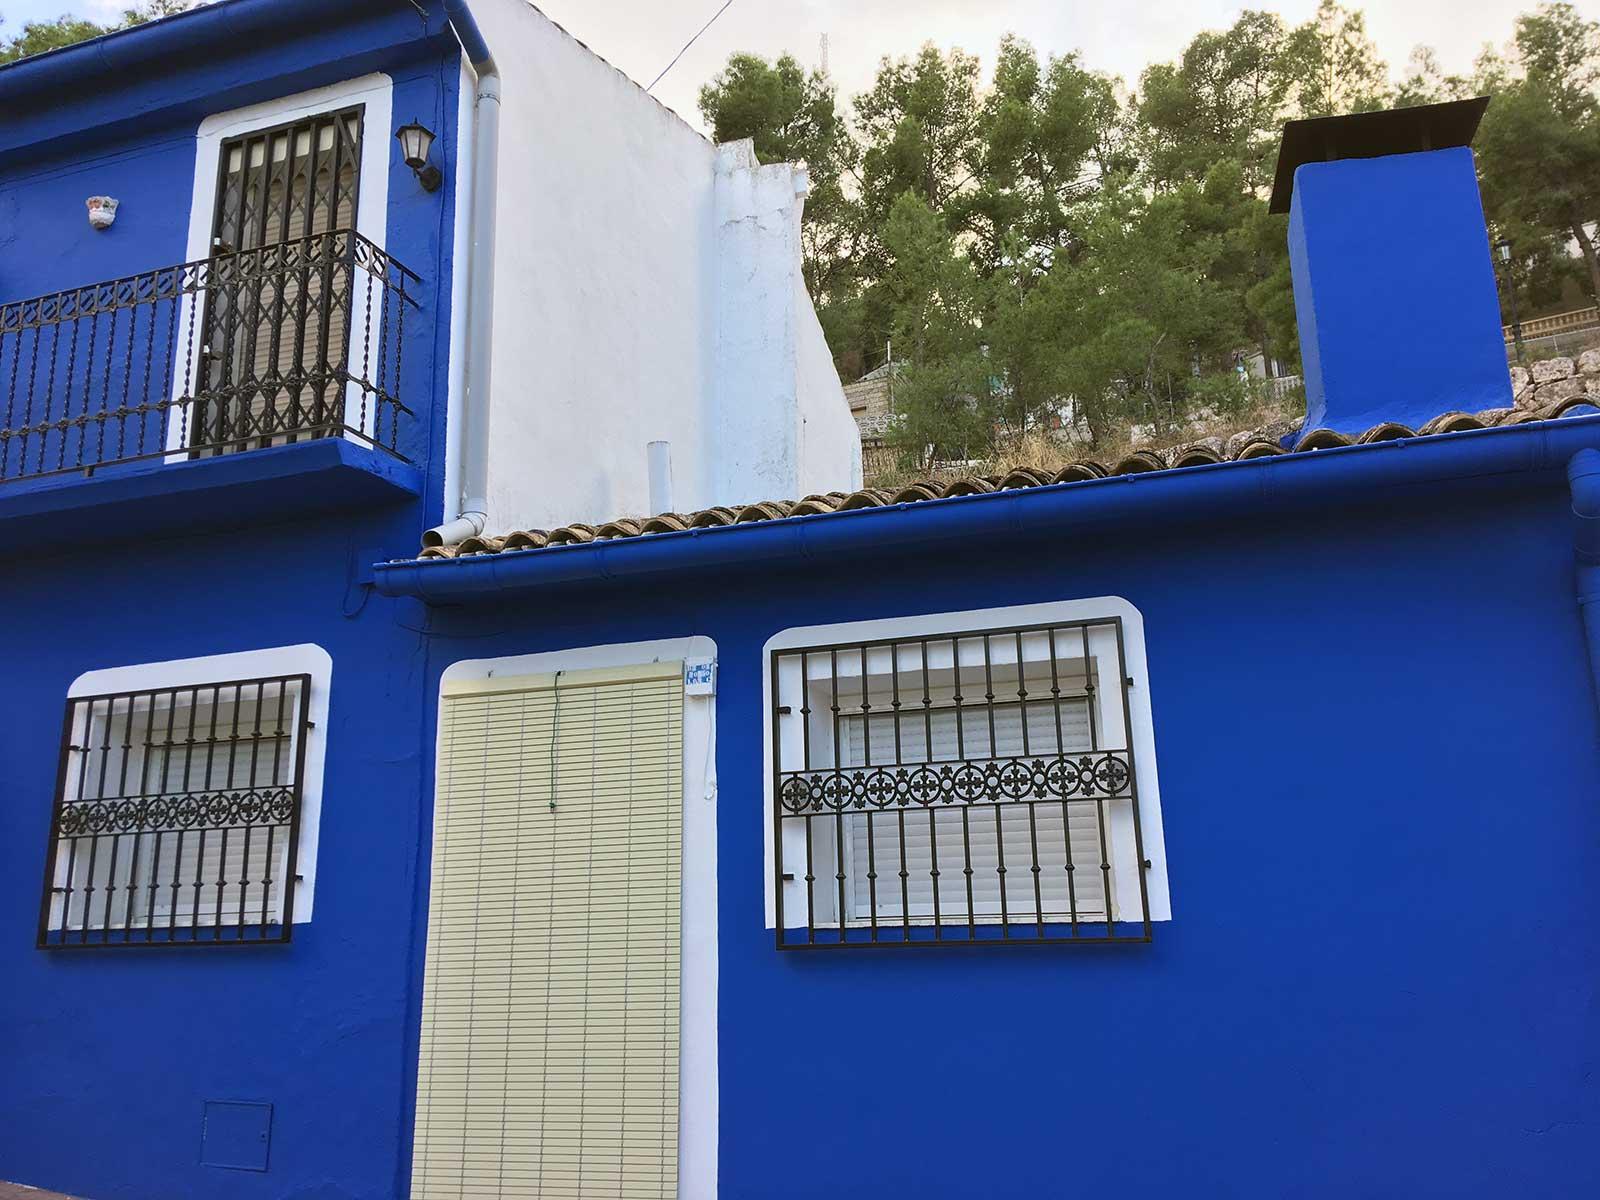 Yecla, casa azul. Sept. 2017